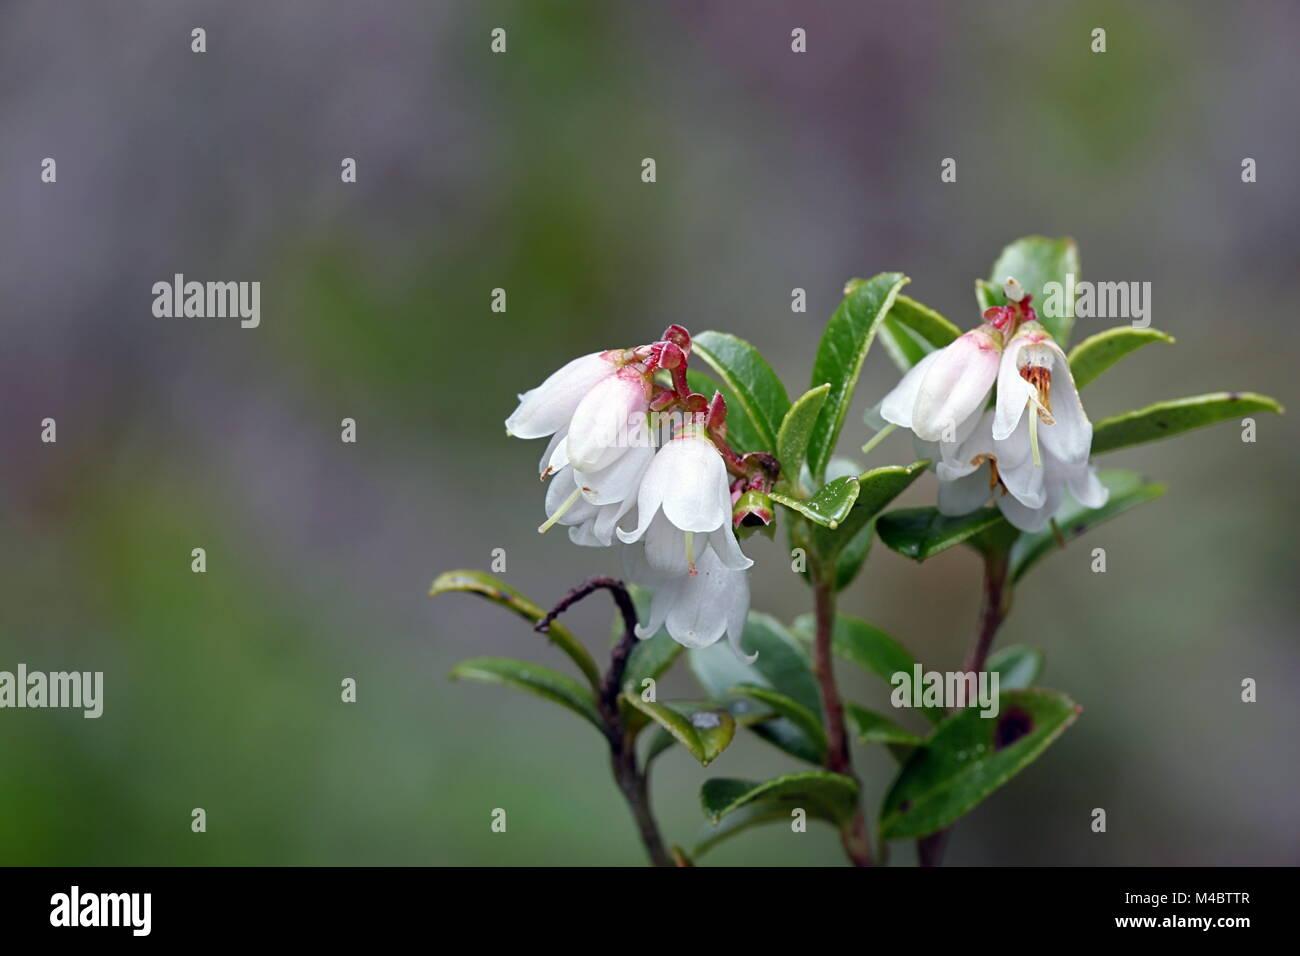 Ou Airelle rouge airelle rouge, Vaccinium vitis-idaea Photo Stock